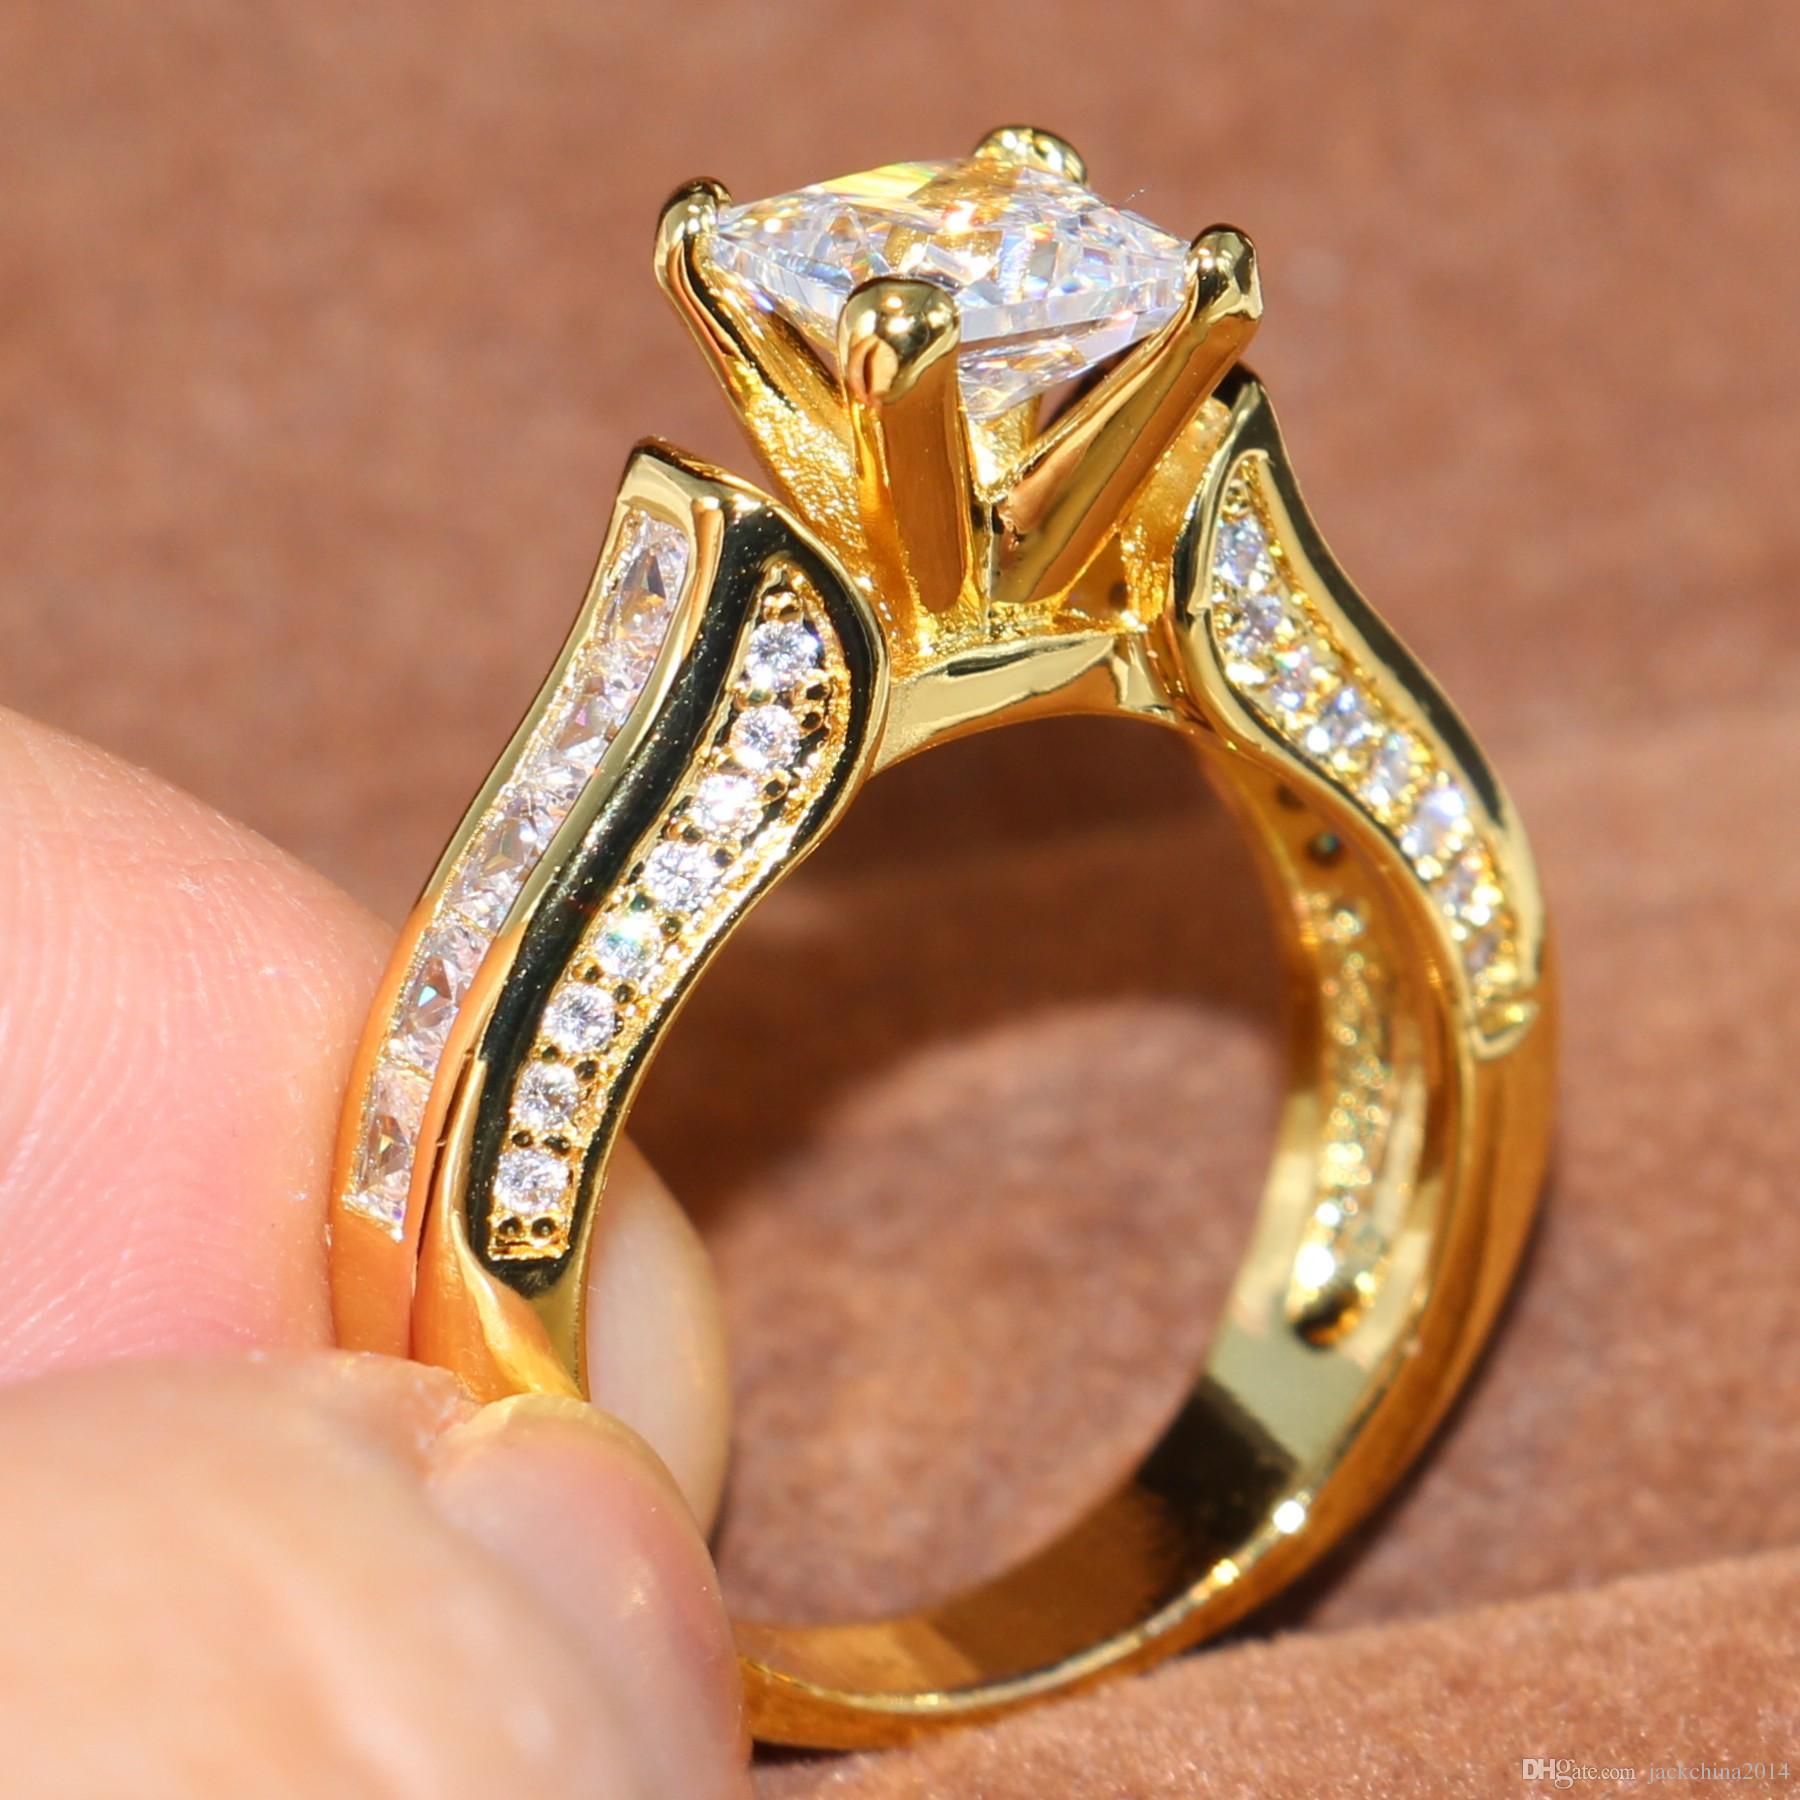 Size 5-11 Sparkling Fashion Jewelry Square 14KT Yellow Gold Filled Princess Cut White Topaz Party Gemstones CZ Diamond Women Wedding Ring